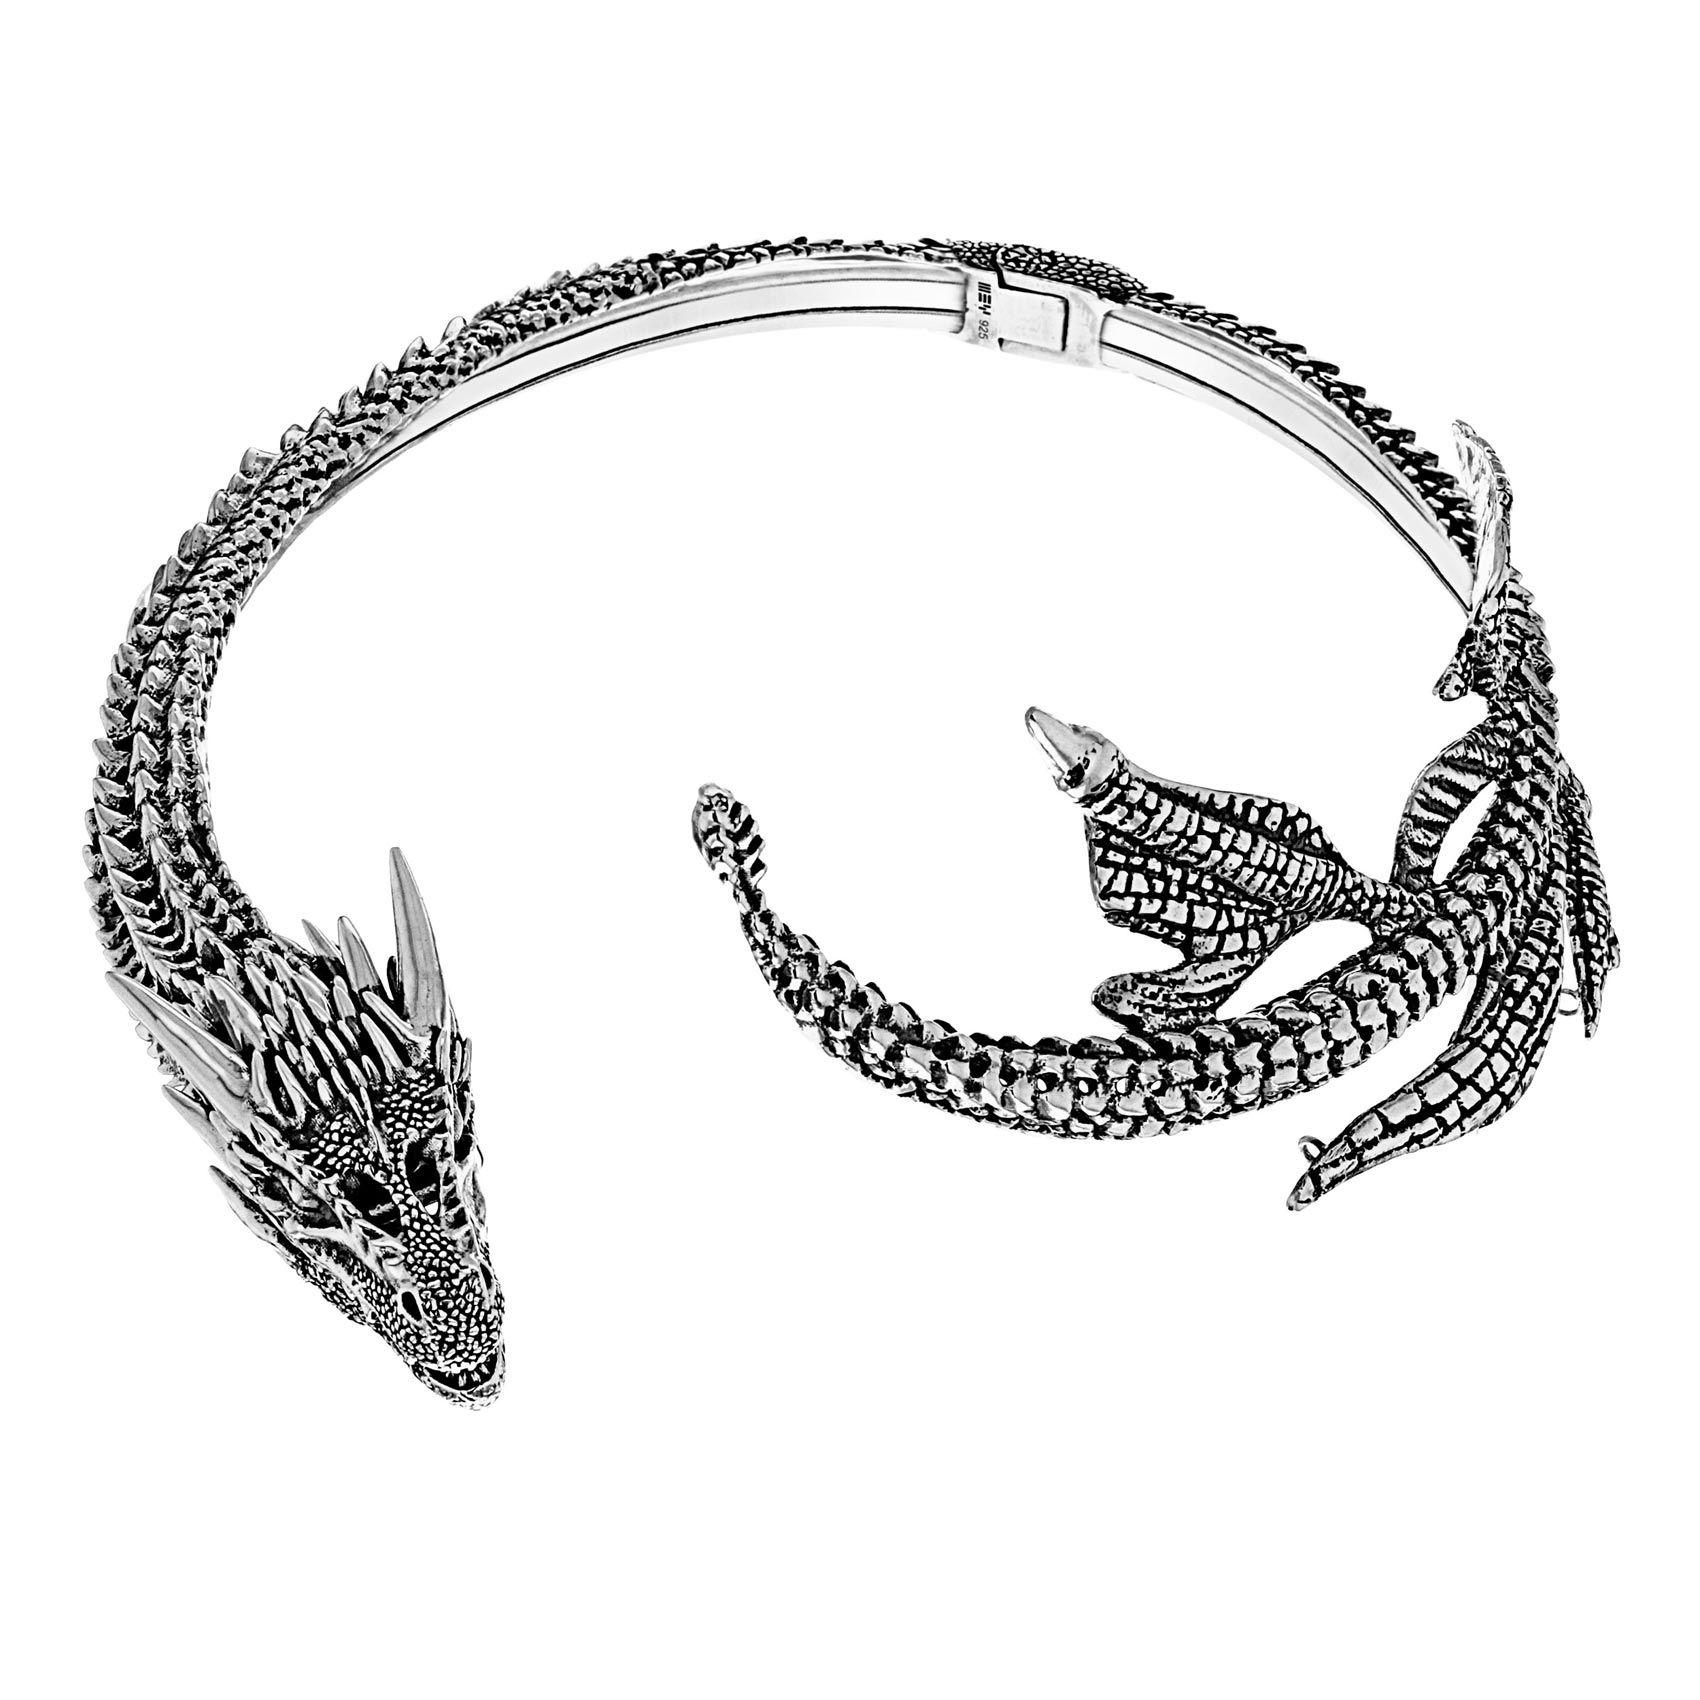 Daenerys Drogon Choker Game Of Thrones Jewelry Game Of